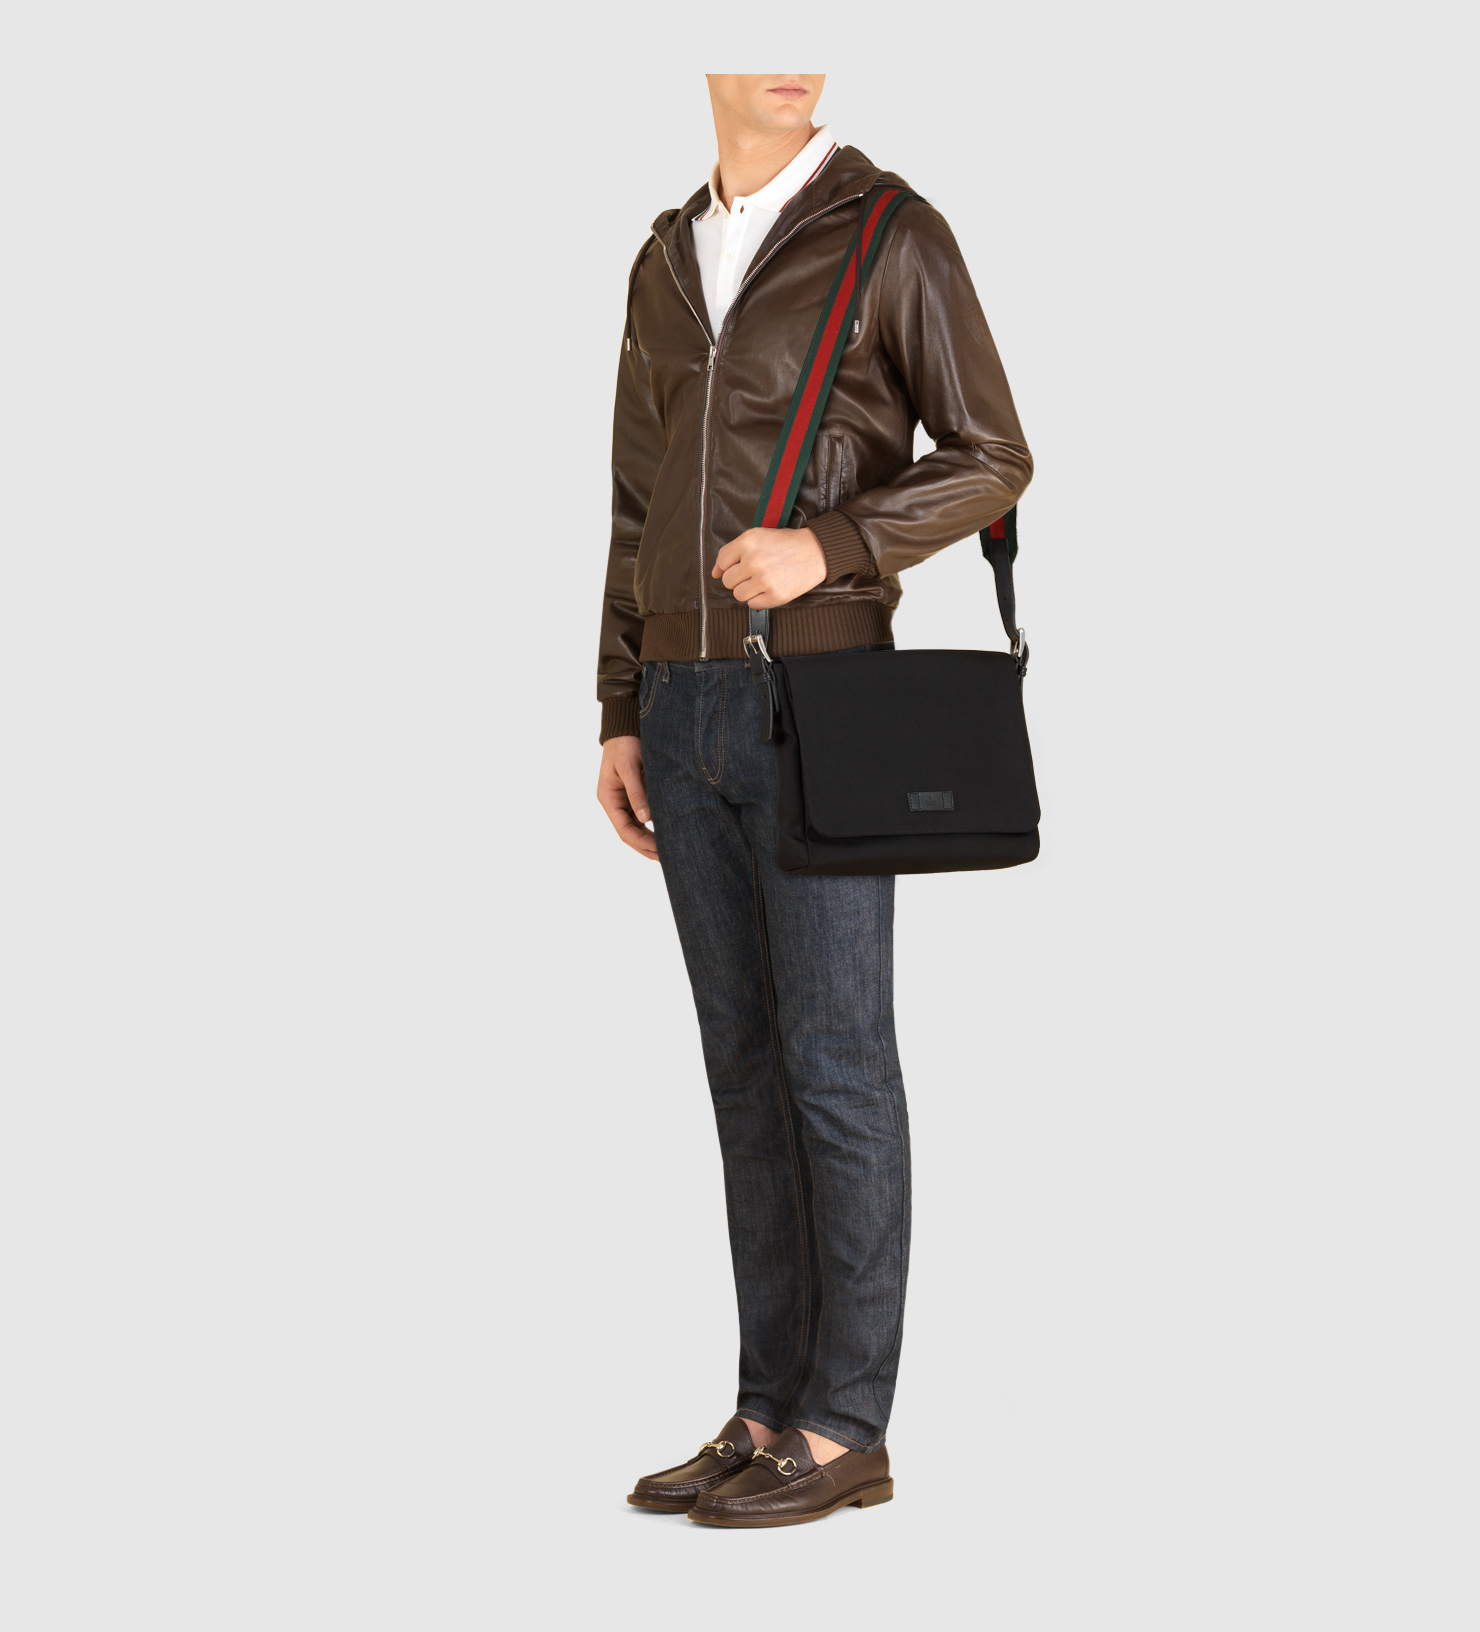 73afbf1f5c Lyst - Gucci Black Techno Canvas Messenger Bag in Black for Men